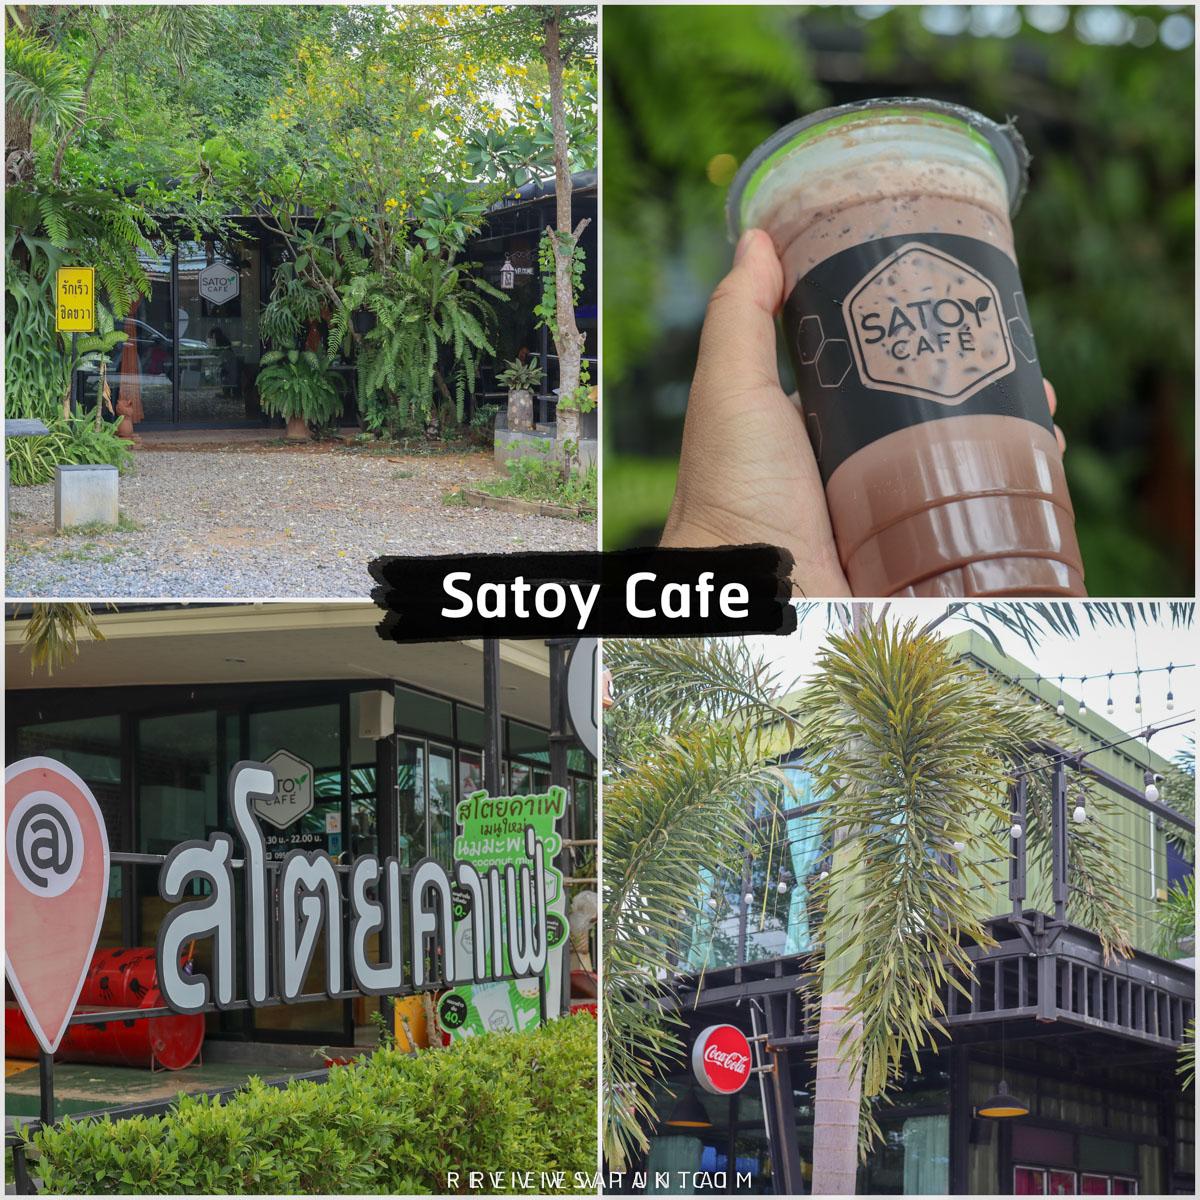 Satoy Cafe' คาเฟ่บรรยากาศร้านนั่งสบายๆ เมนูอาหารเยอะมีทั้งสเต็ก สปาเก็ตตี้ ของหวานบิงซู ไอศกรีม กาแฟ บริการดีเยี่ยม 10/10 รายละเอียด คลิก จุดเช็คอิน,หลีเป๊ะ,สตูลสดยกกำลังสาม,satunwonderland,เที่ยวเมืองไทยAmazingกว่าเดิม,ชีพจรลงSouth